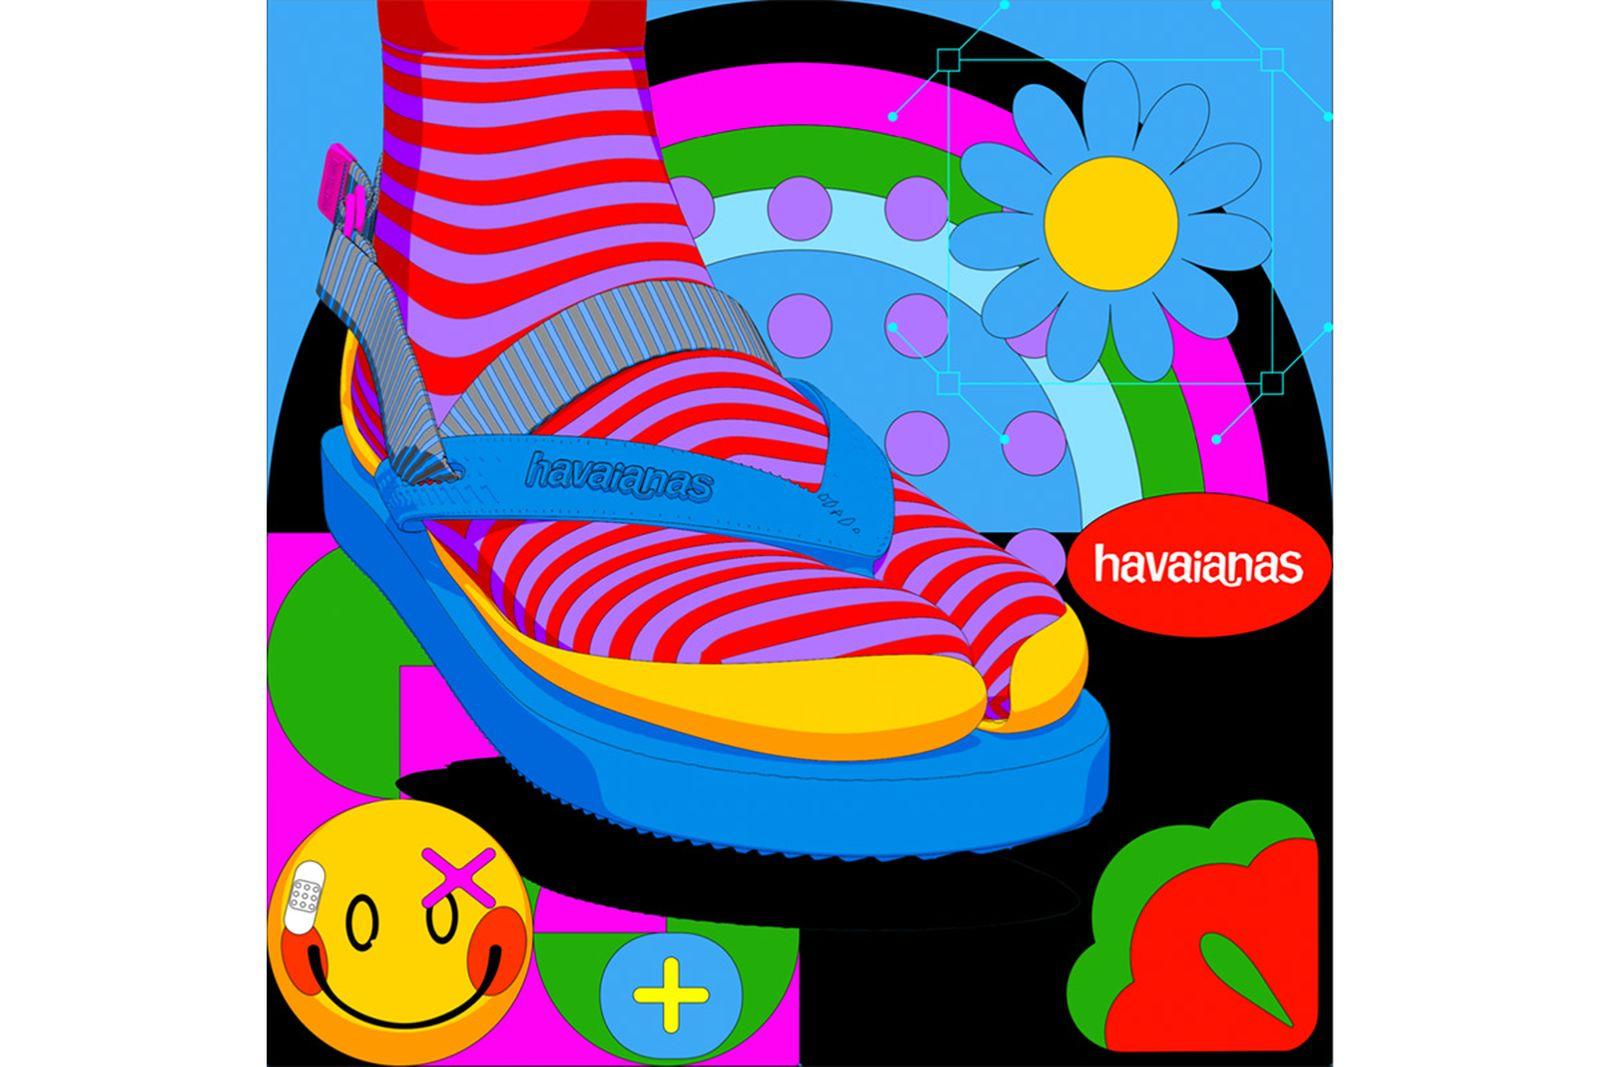 havaianas-nft-05